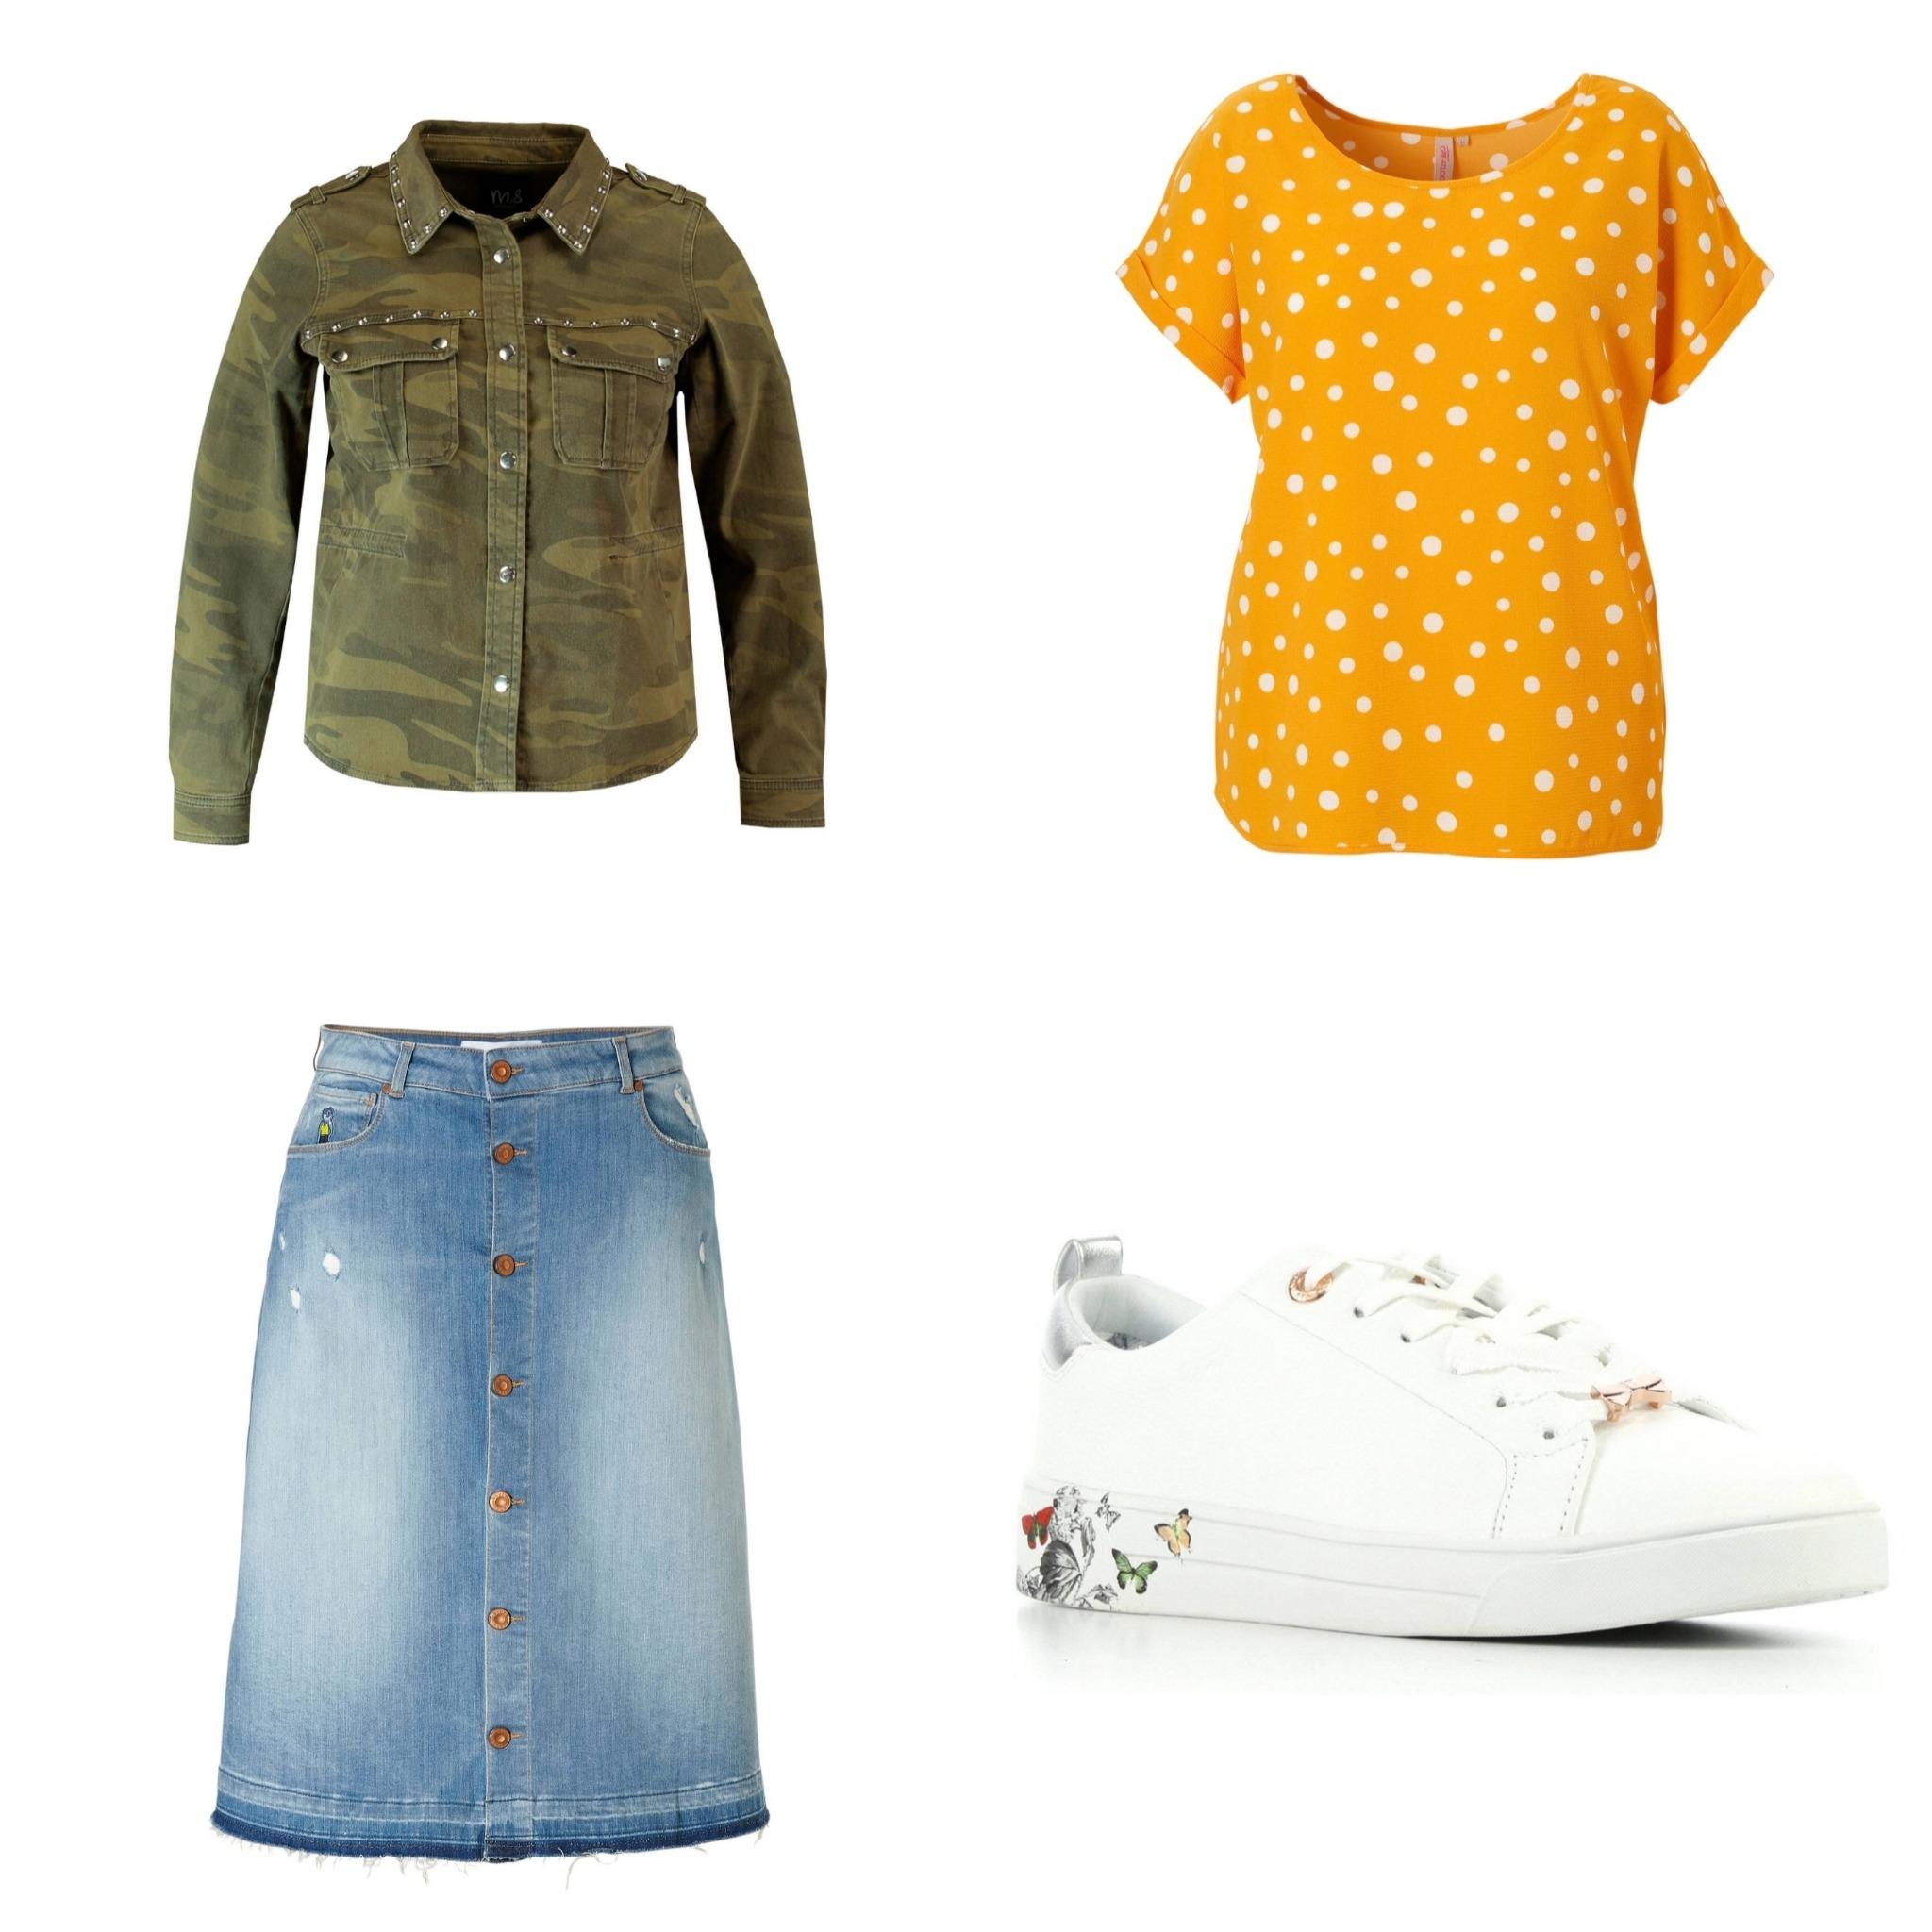 Plus Size Fashion Friday || Girls wear skirts